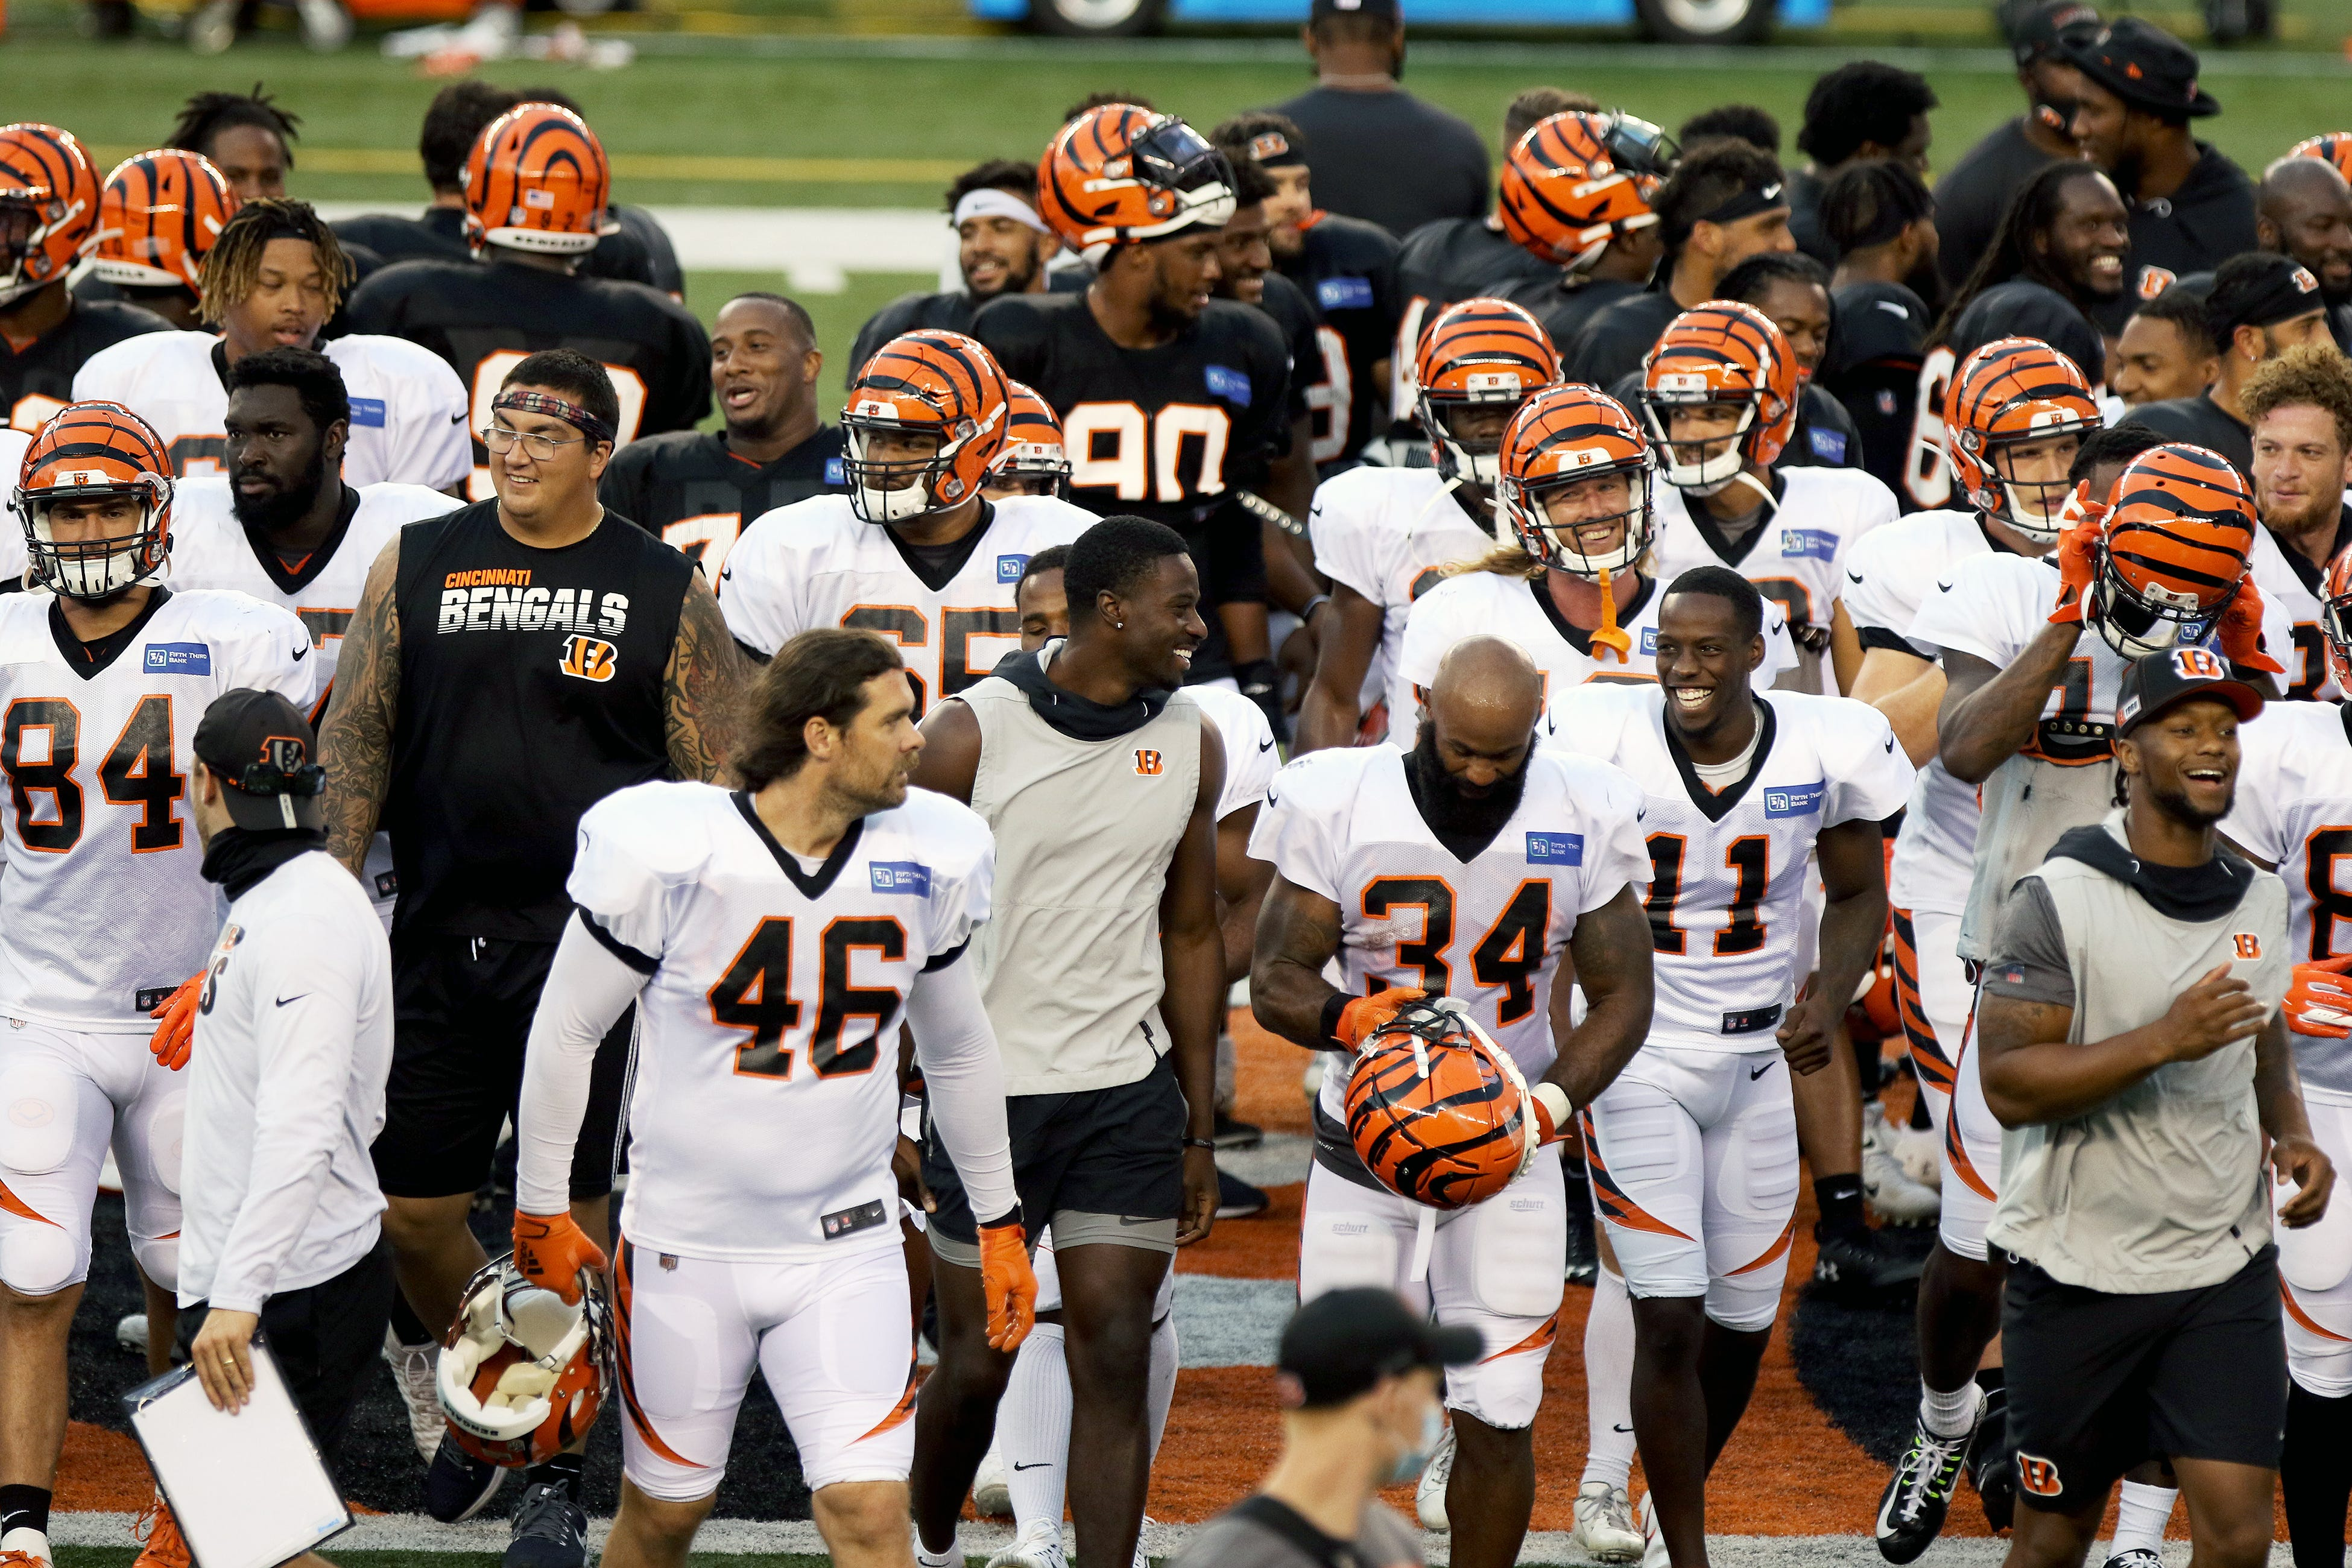 Cincinnati Bengals wide receiver Auden Tate breakout 2020 year